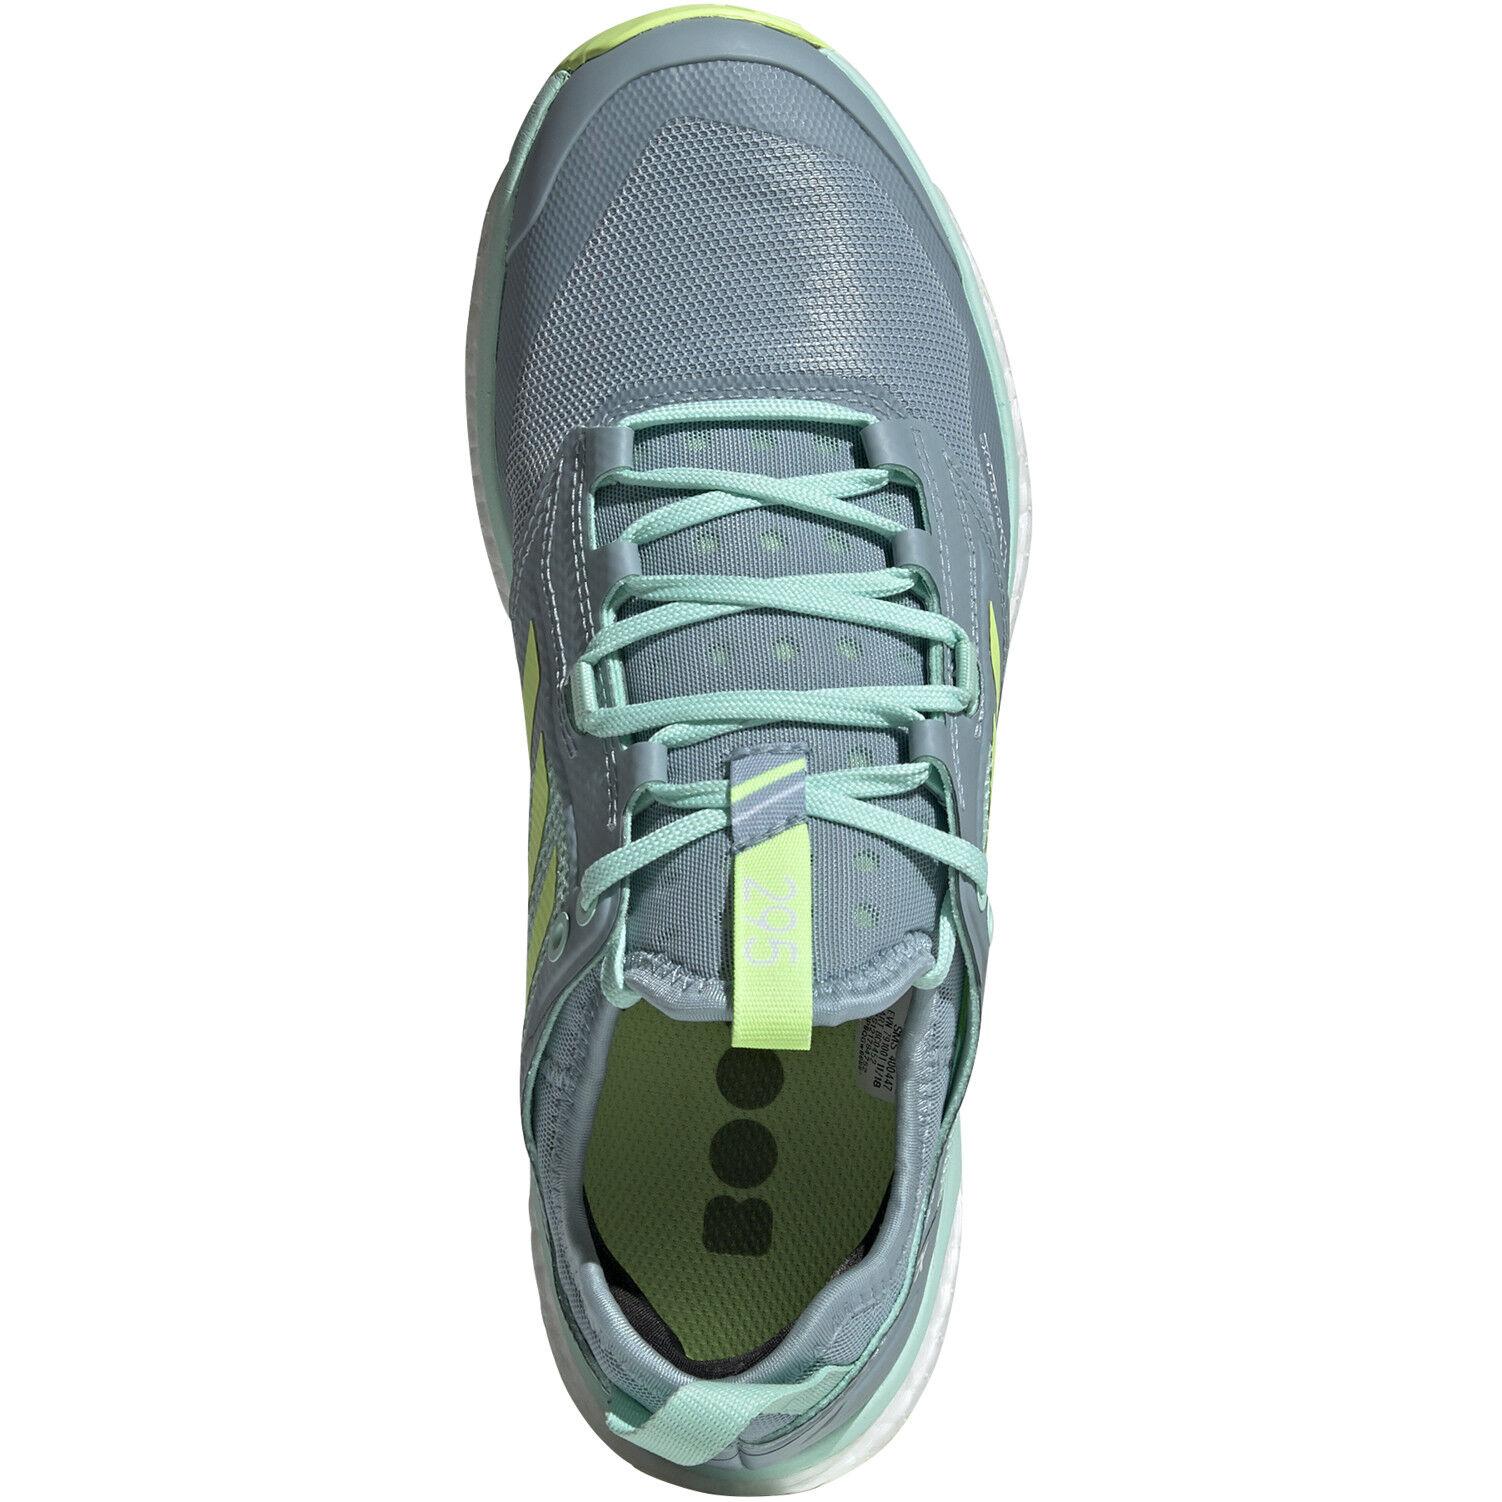 TERREX XT Damen GTX greyhi yellowclear Schuhe res mint adidas Agravic ash QrdBeWECxo